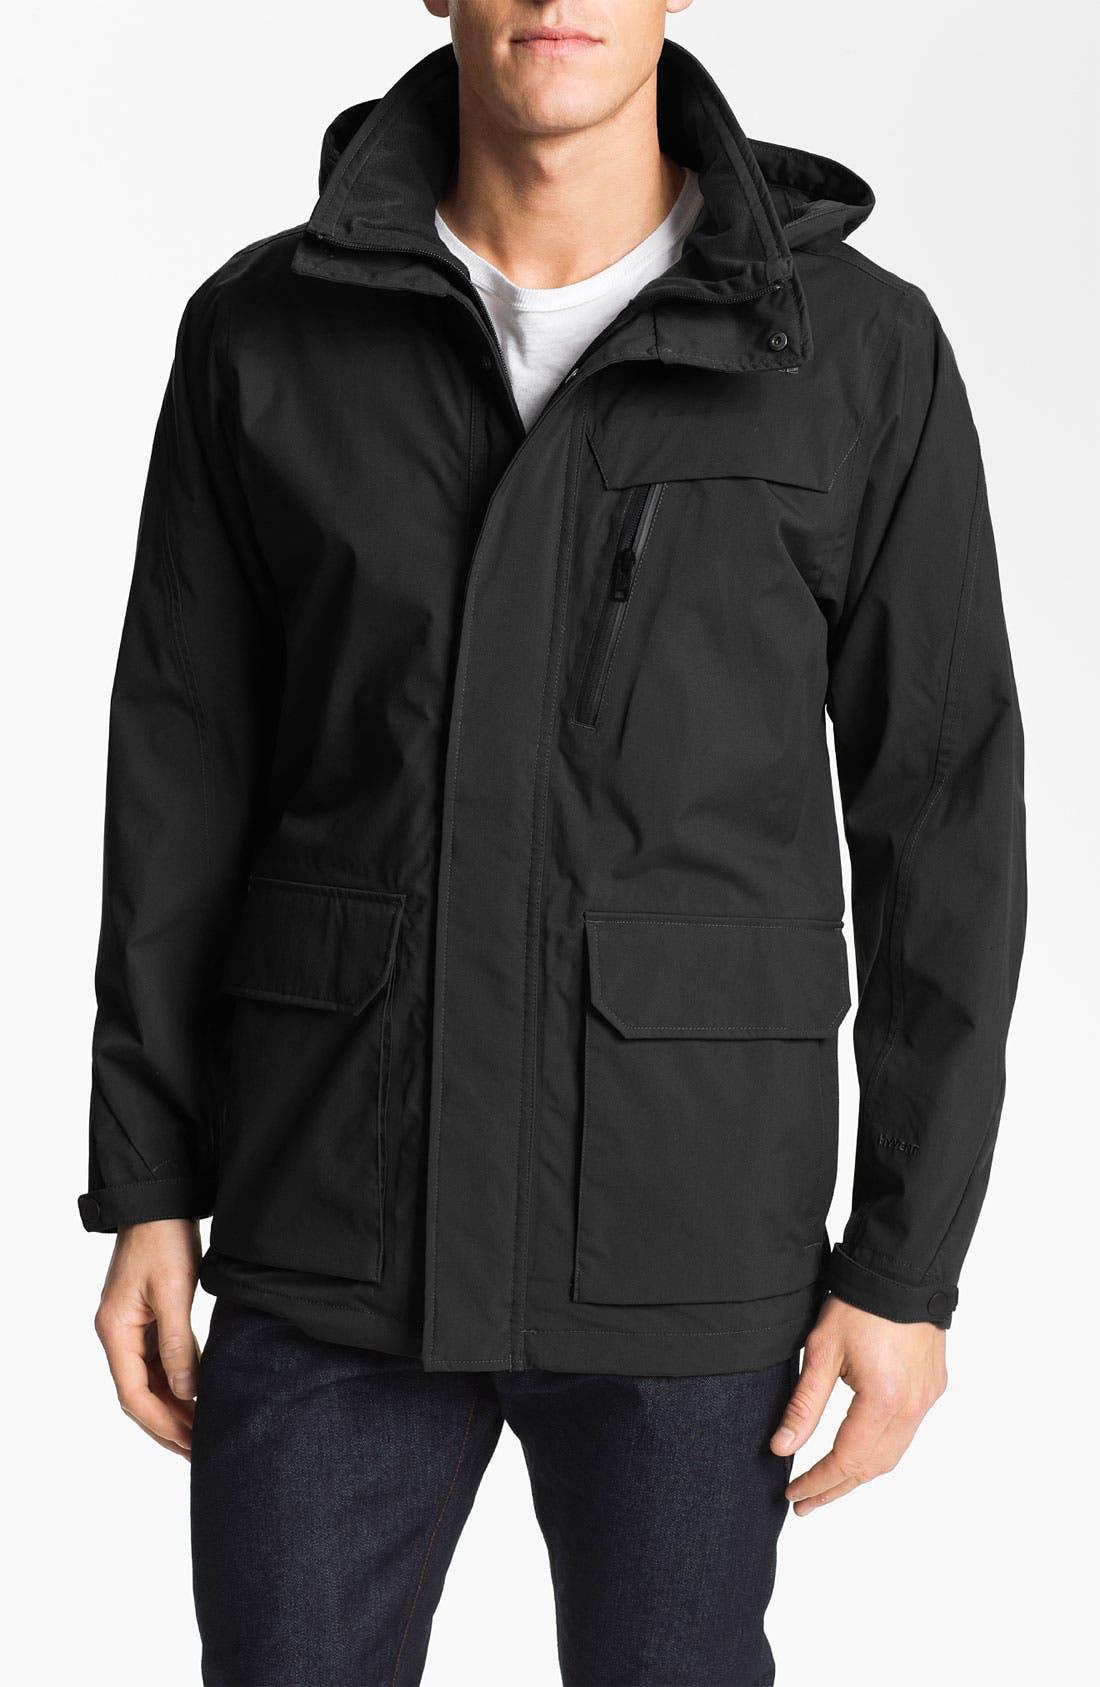 Main Image - The North Face 'Kearny' Waterproof Hooded Jacket